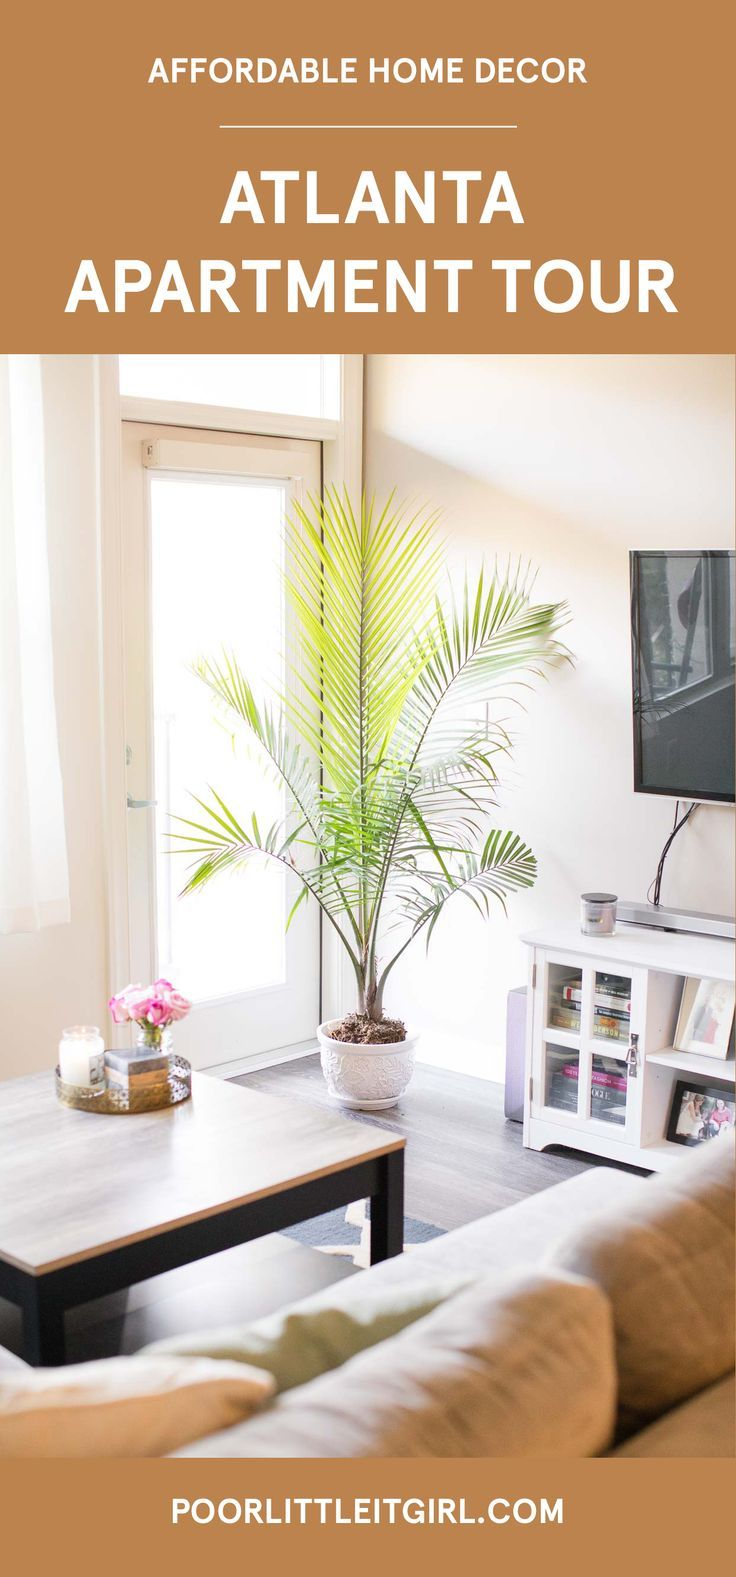 Atlanta Apartment Tour Affordable Home Decor